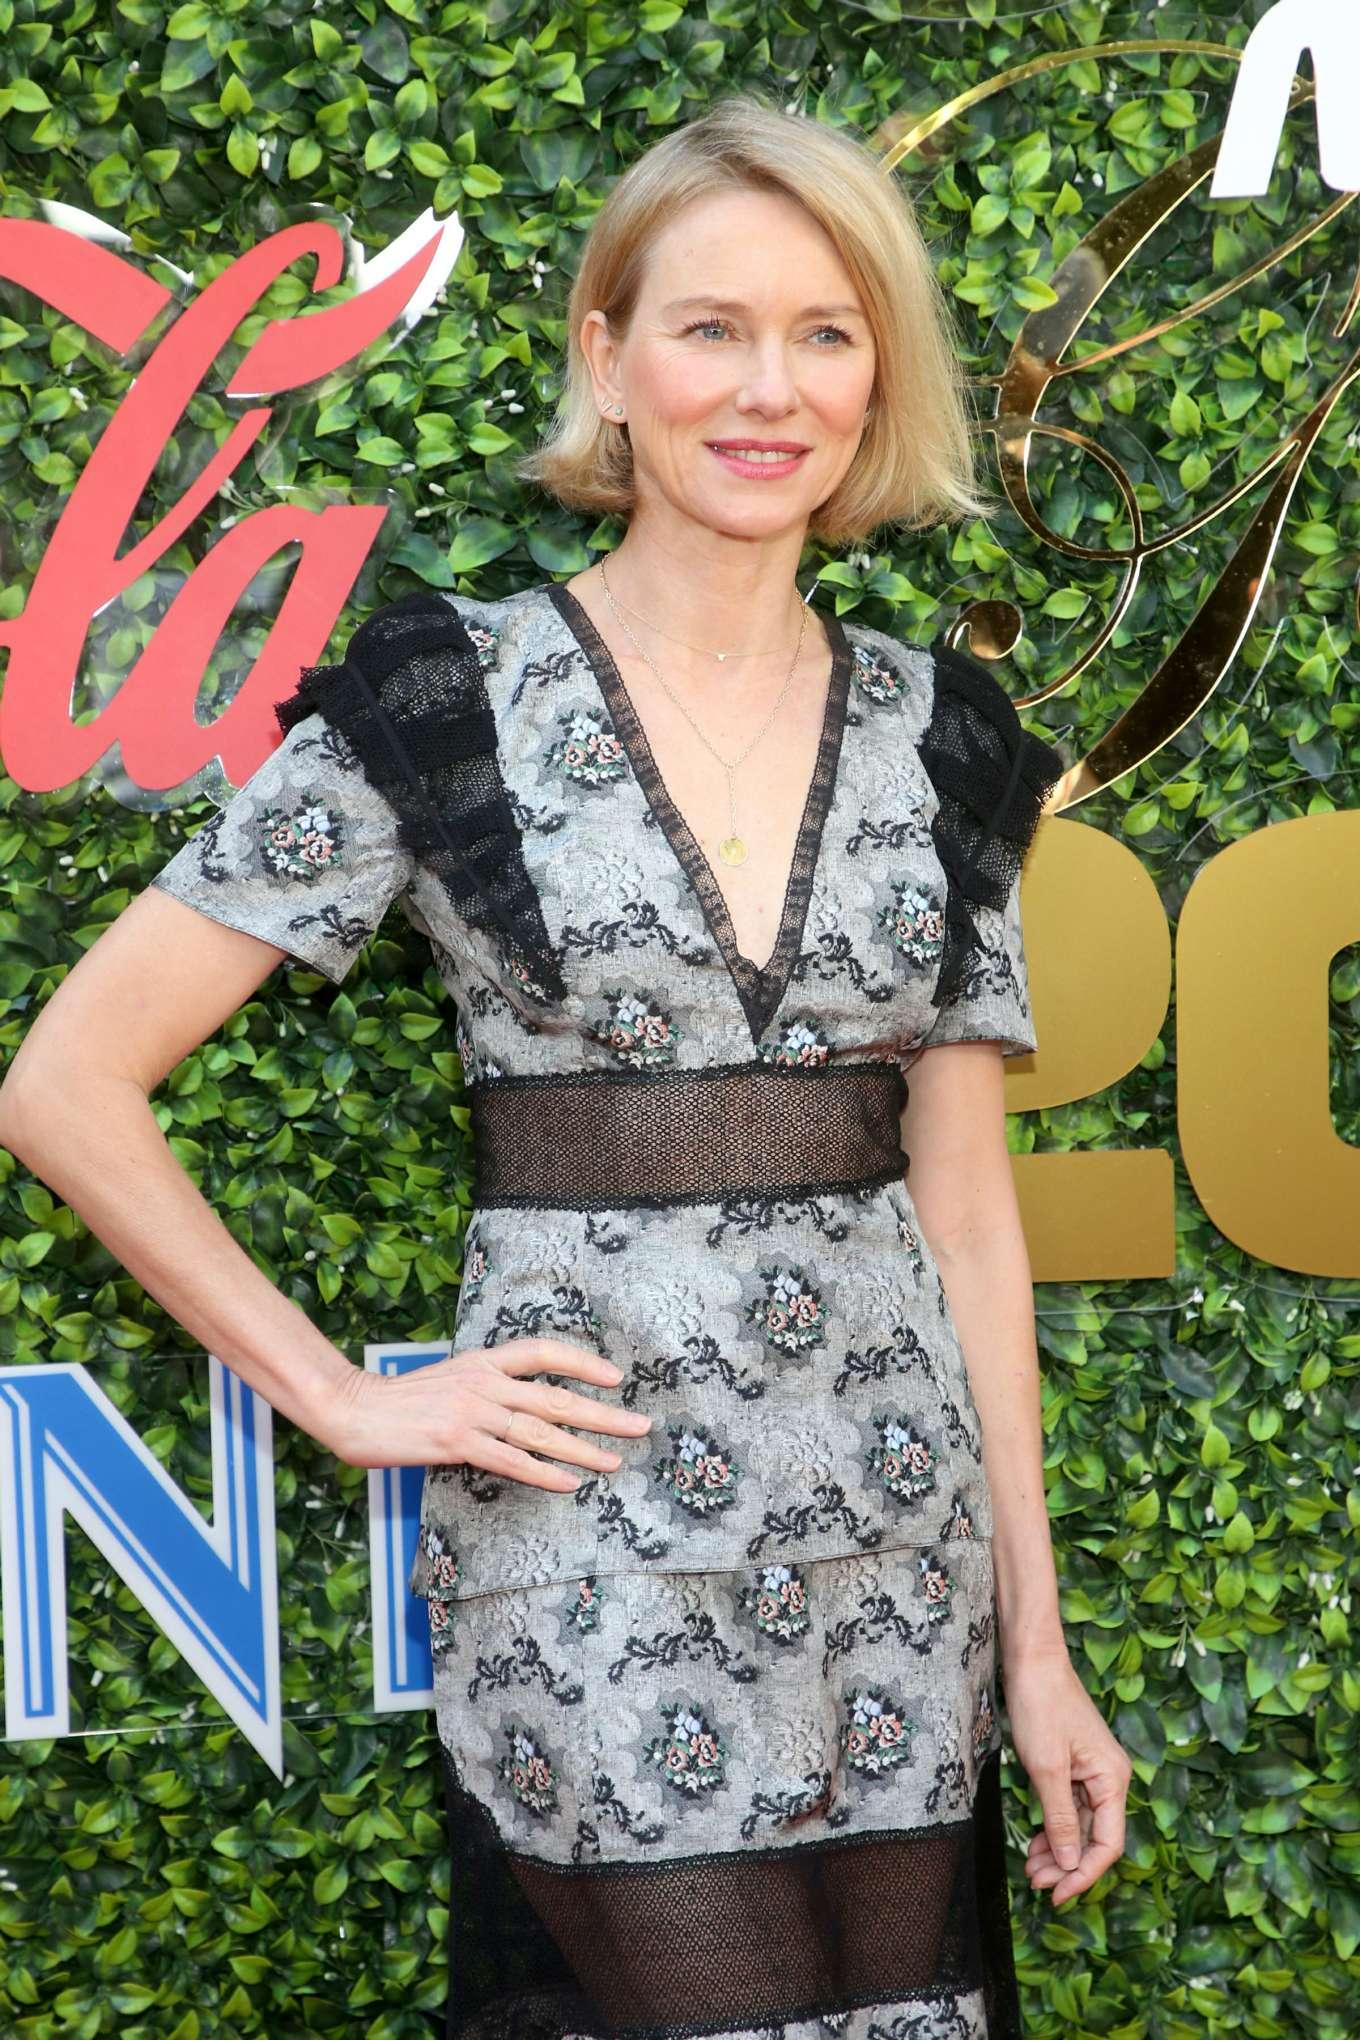 Naomi Watts 2020 : Naomi Watts – 2020 Gold Meets Golden-10